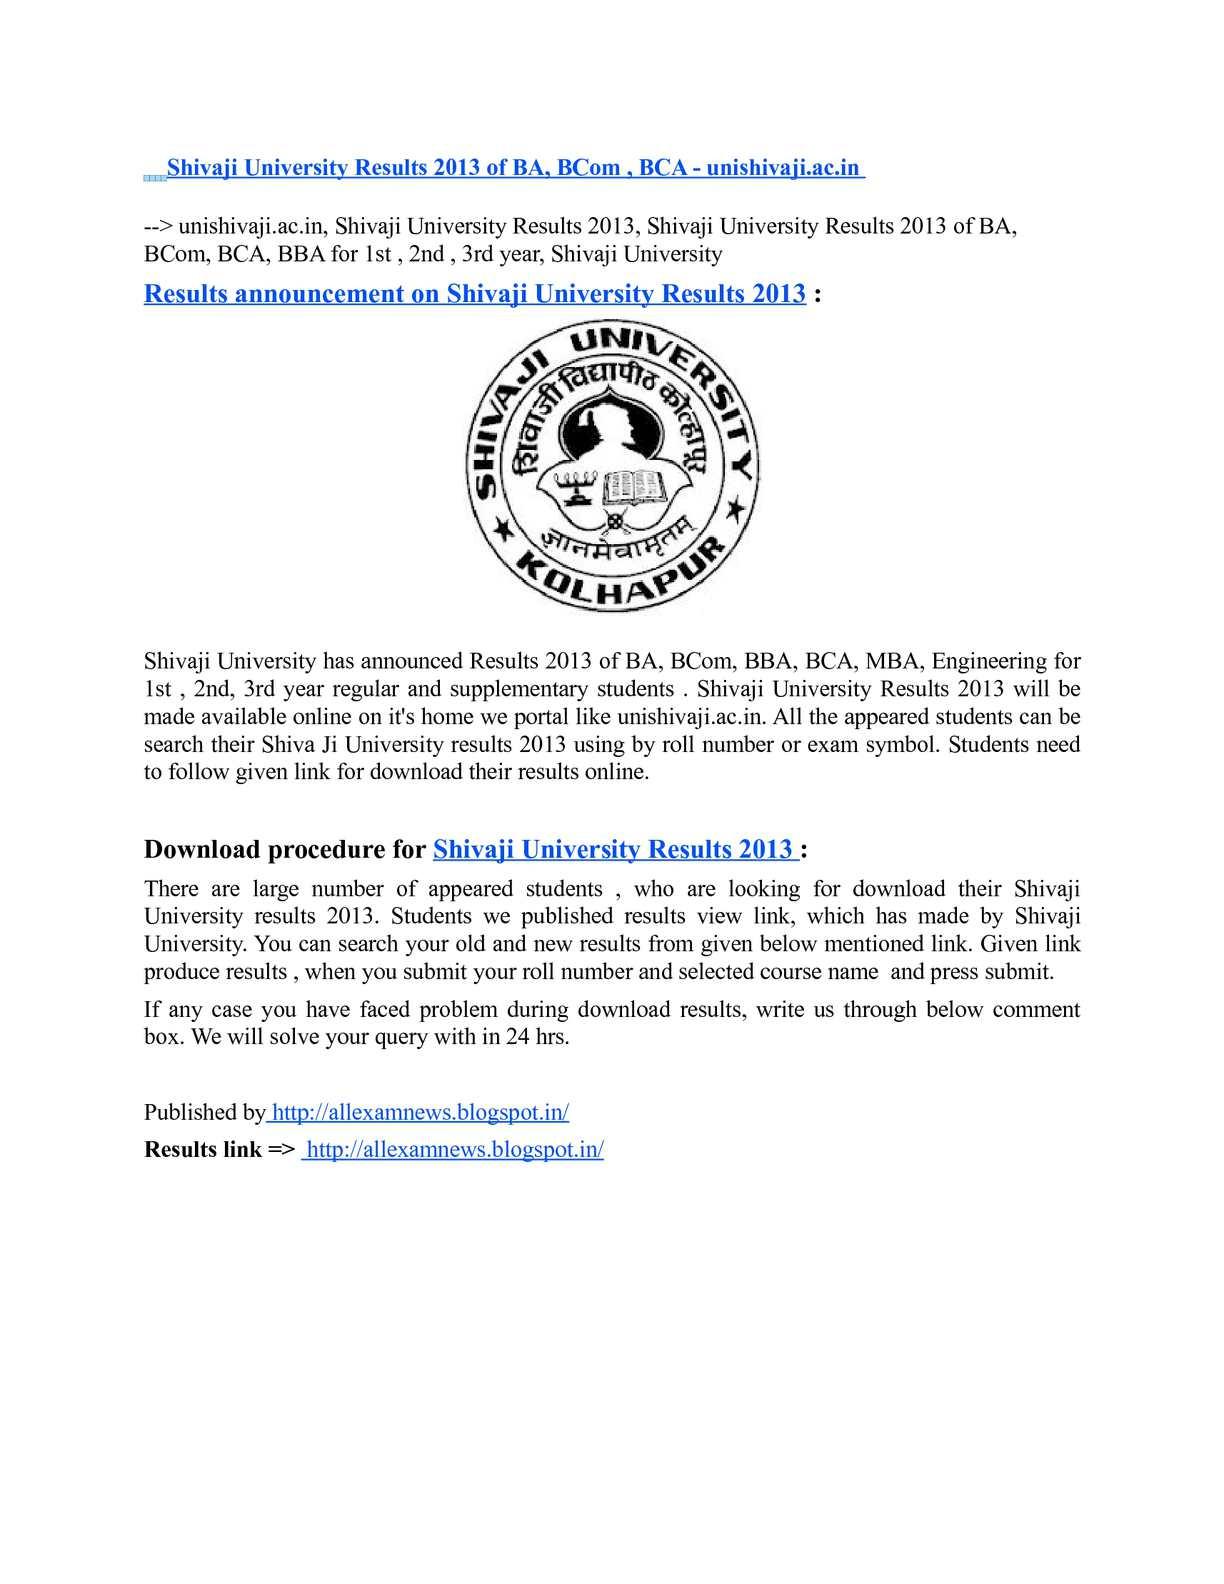 Calaméo - Shivaji University Results 2013 of BA, BCom , BCA